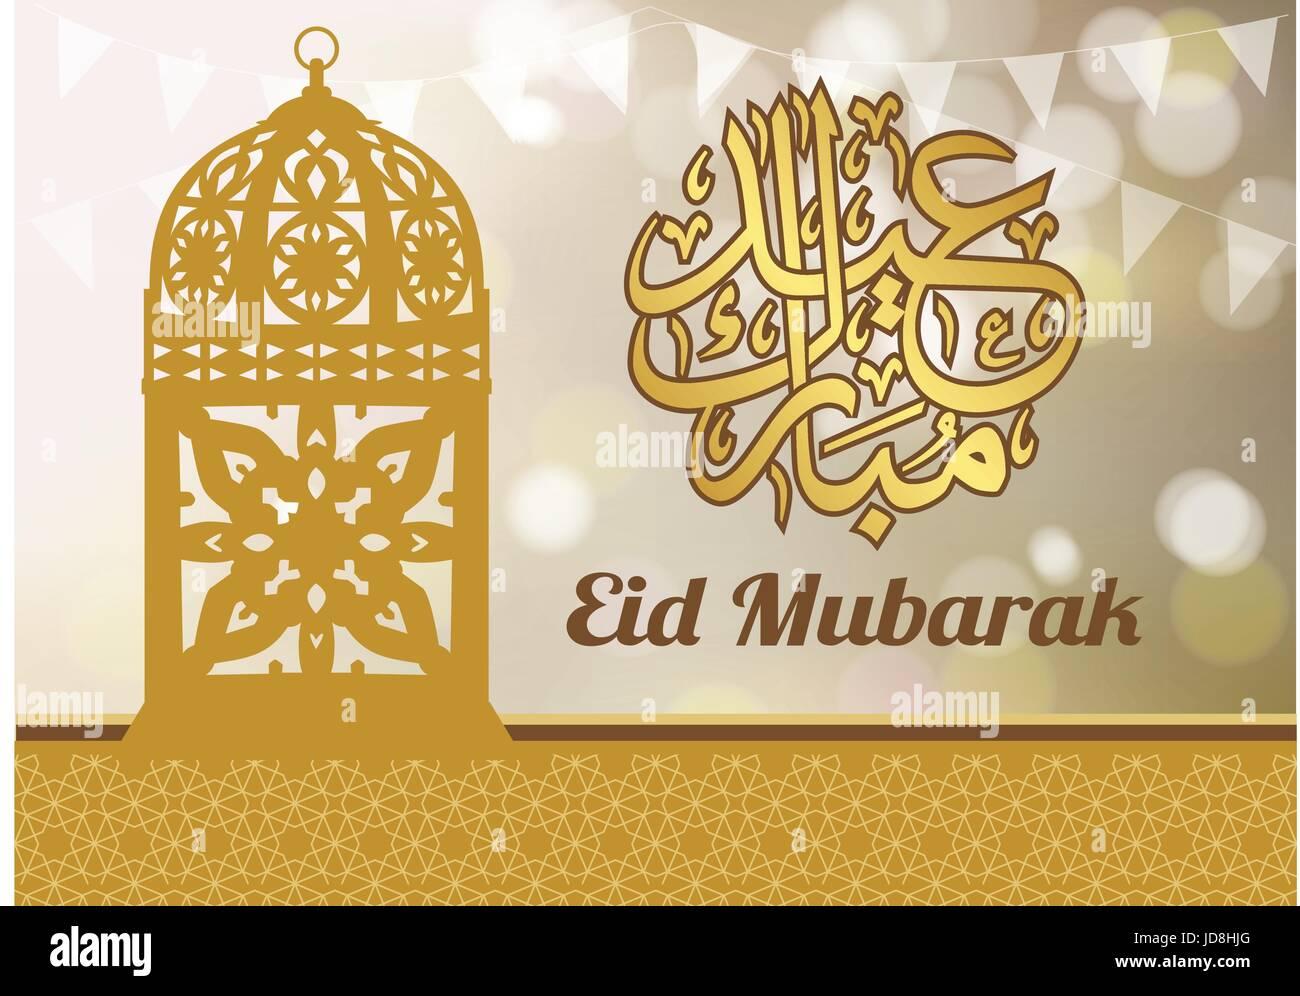 Eid Mubarak Calligraphy Stock Photos Eid Mubarak Calligraphy Stock